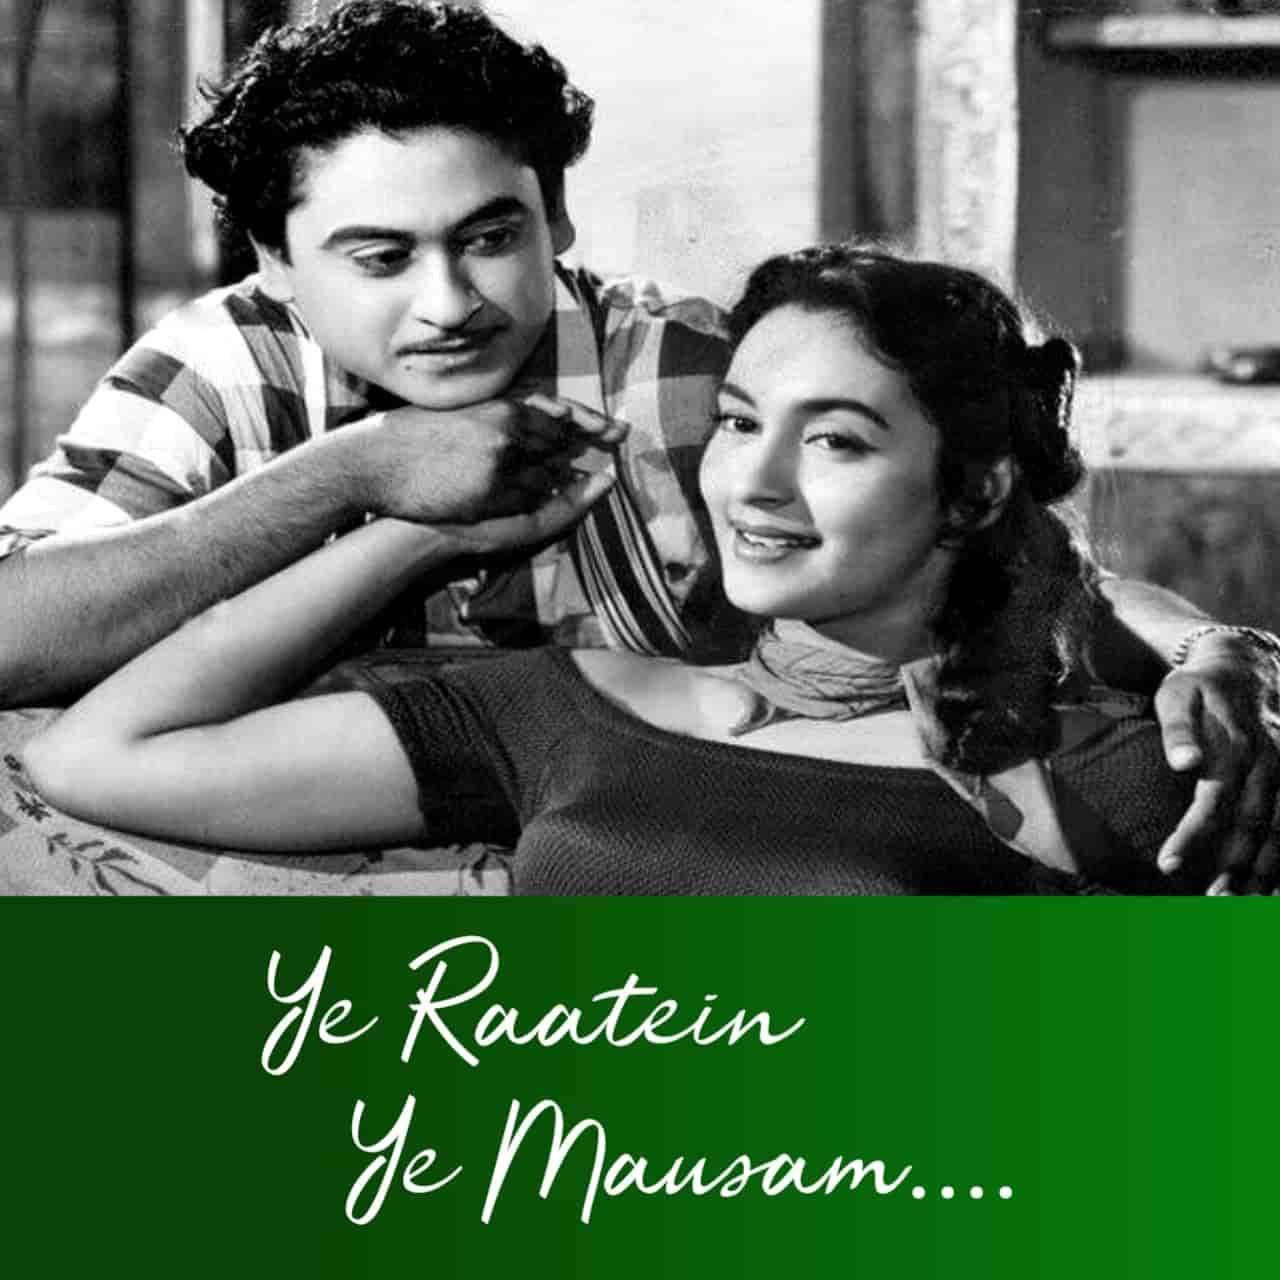 Ye Raatein Ye Mausam Hindi Song Lyrics, Sung By Kishor Kumar.